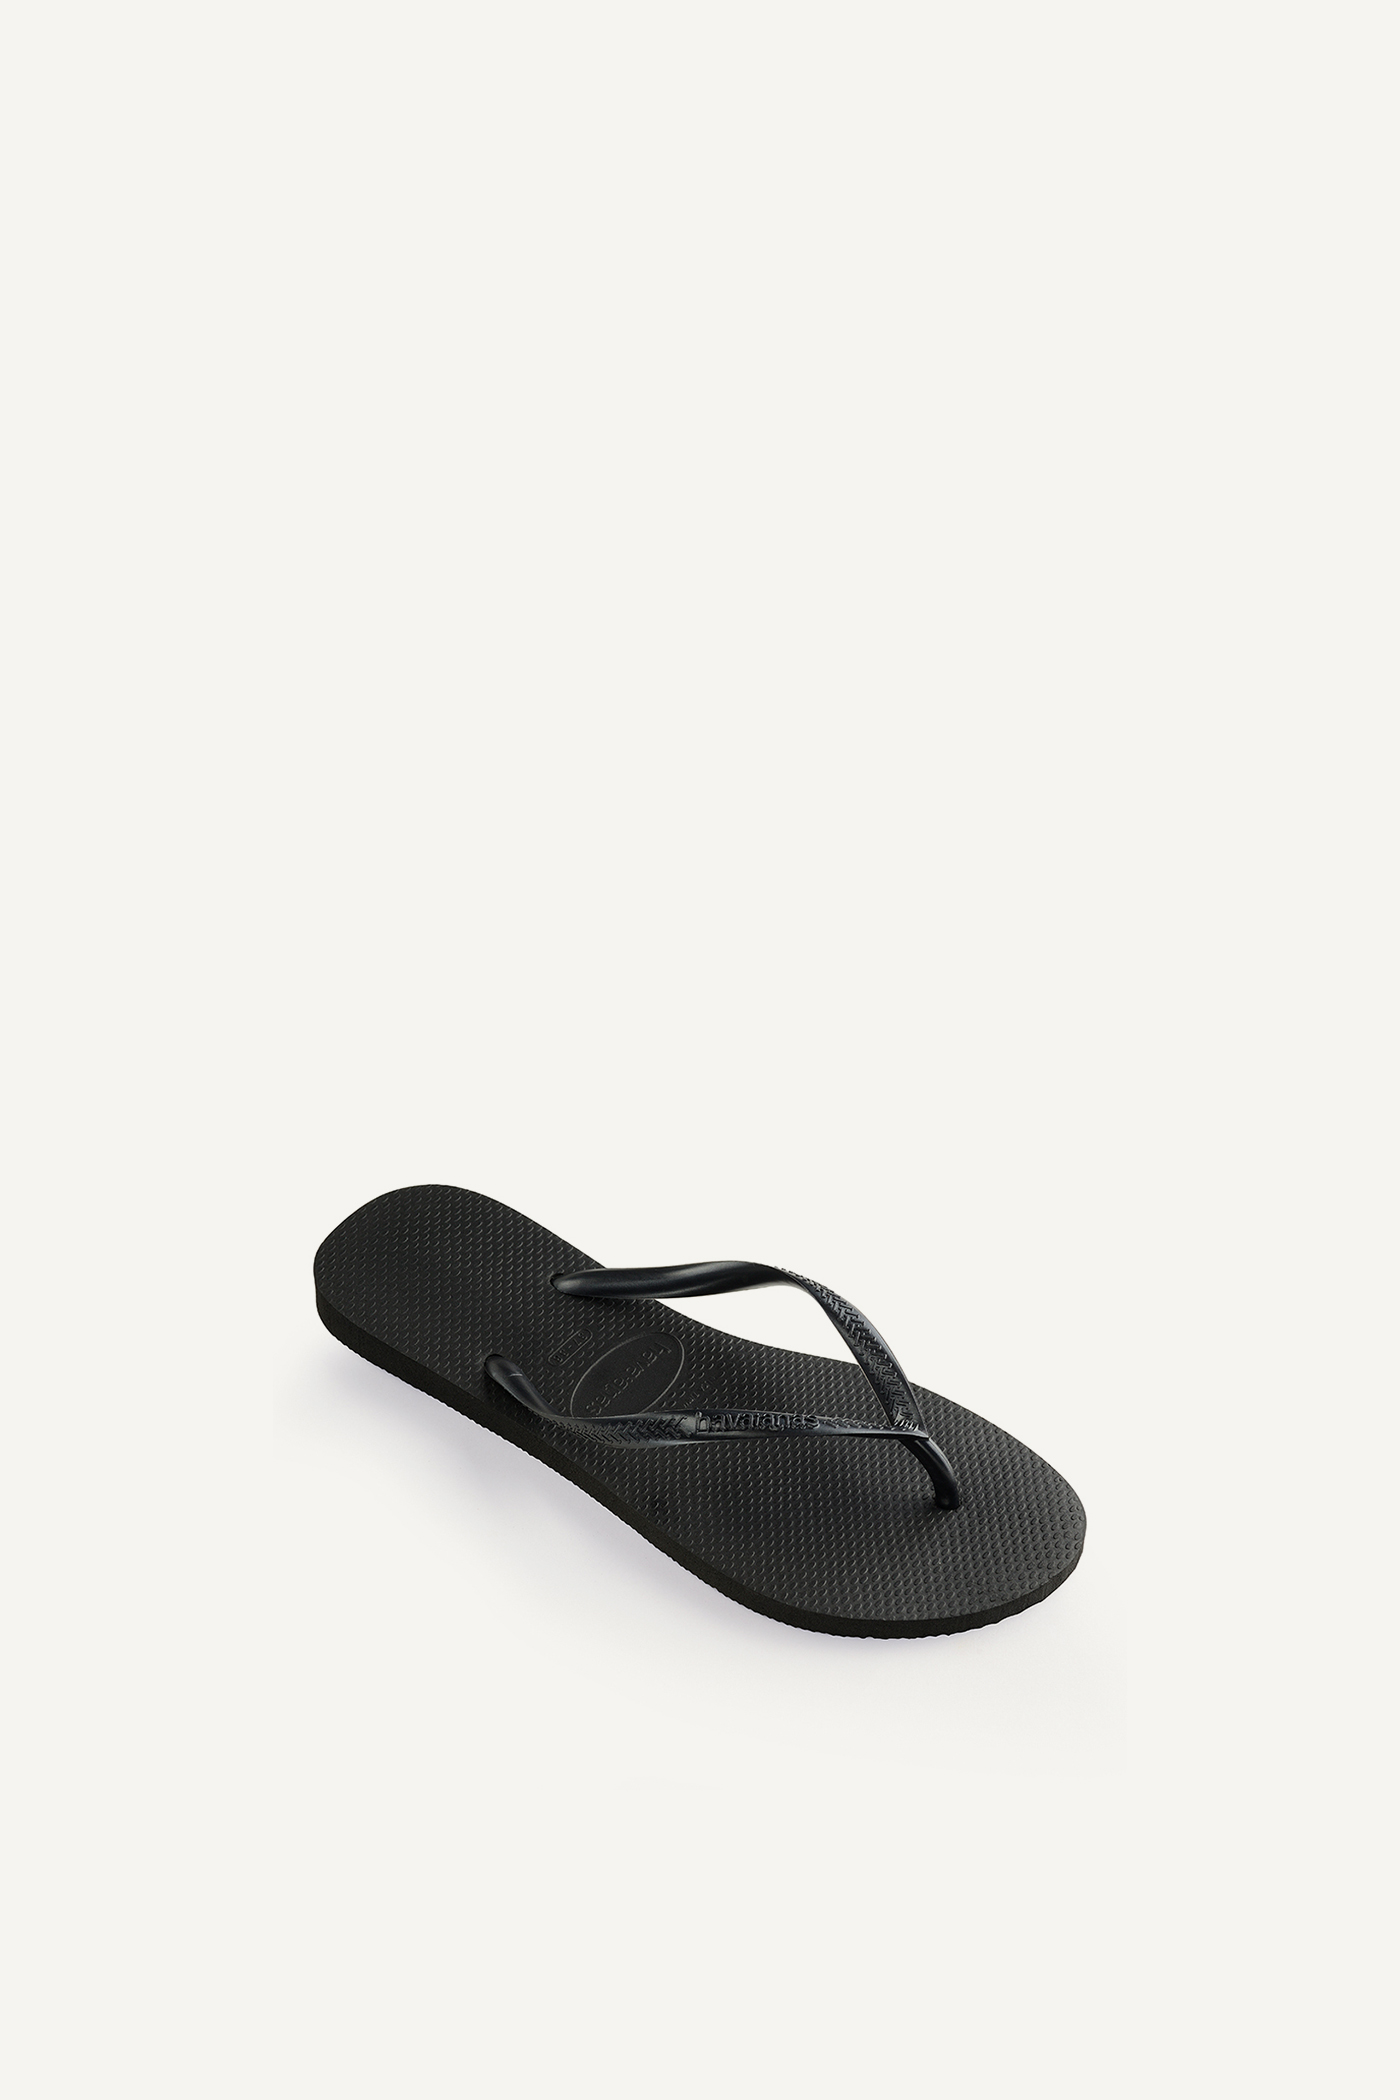 Havaianas Women Flip Flop